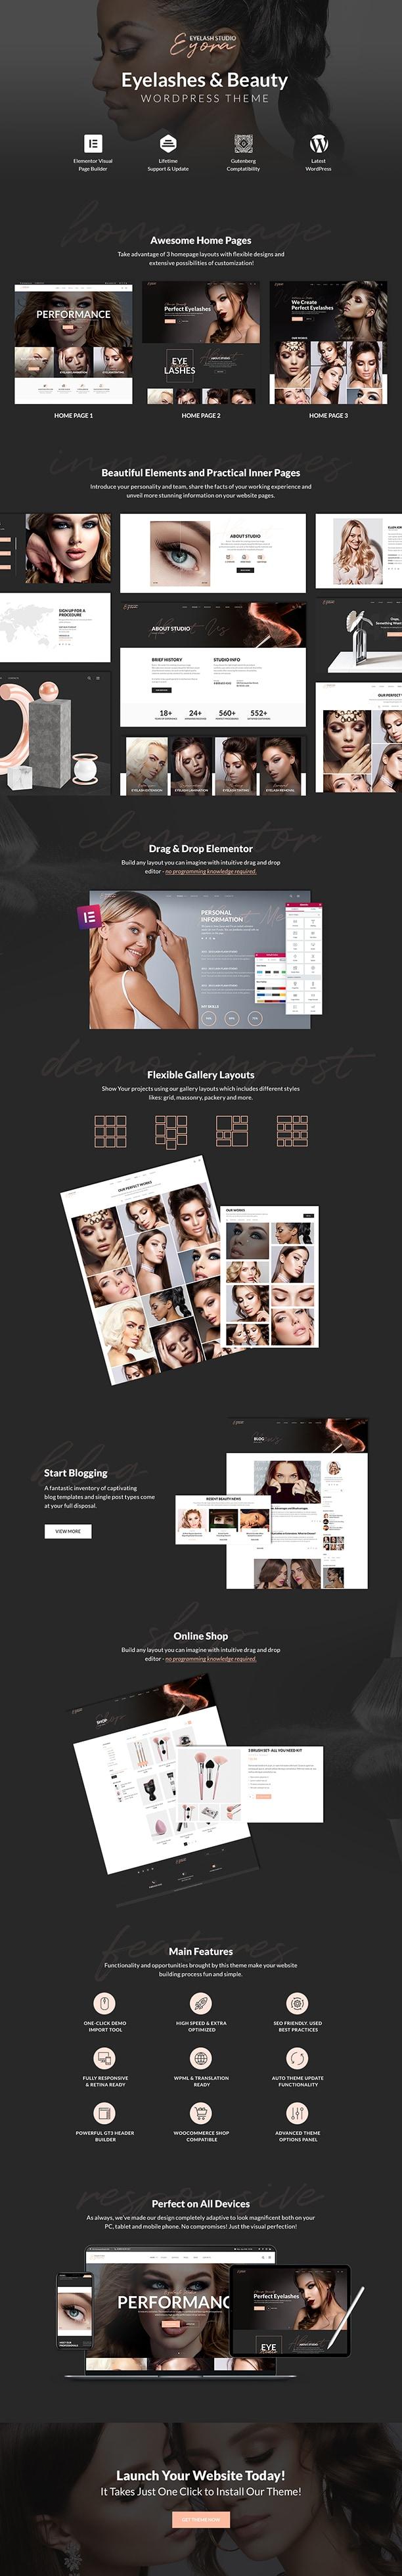 Eyora – Eyelash Extension & Lash Lift WordPress Theme - 1